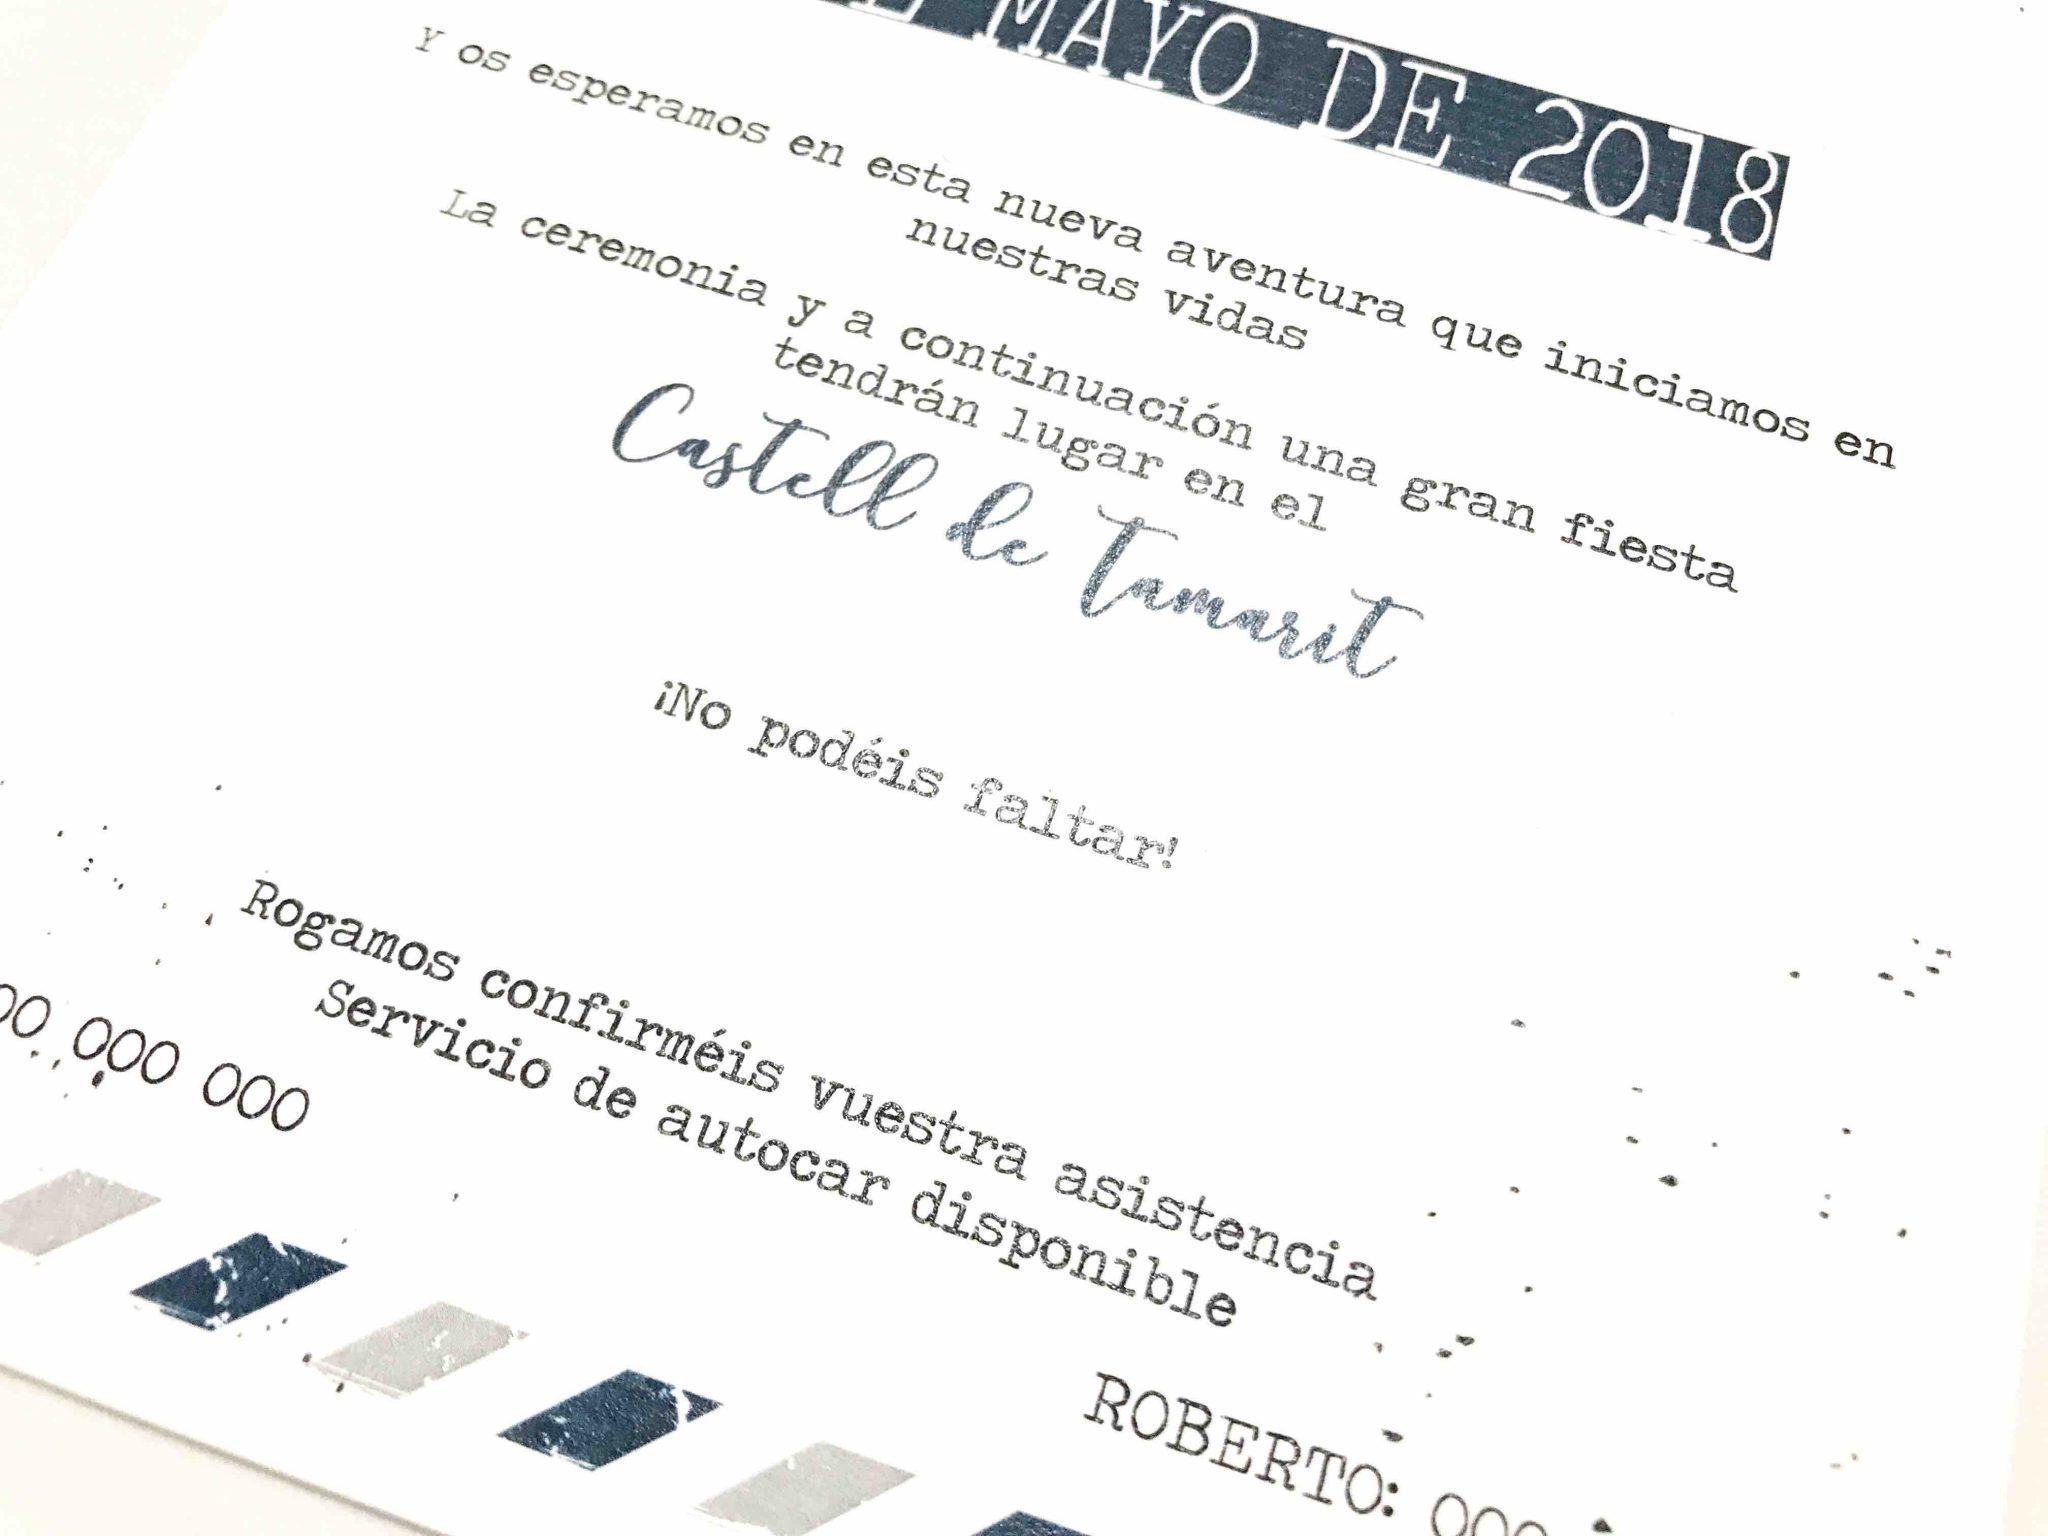 invitacion de boda viaje detalle letras